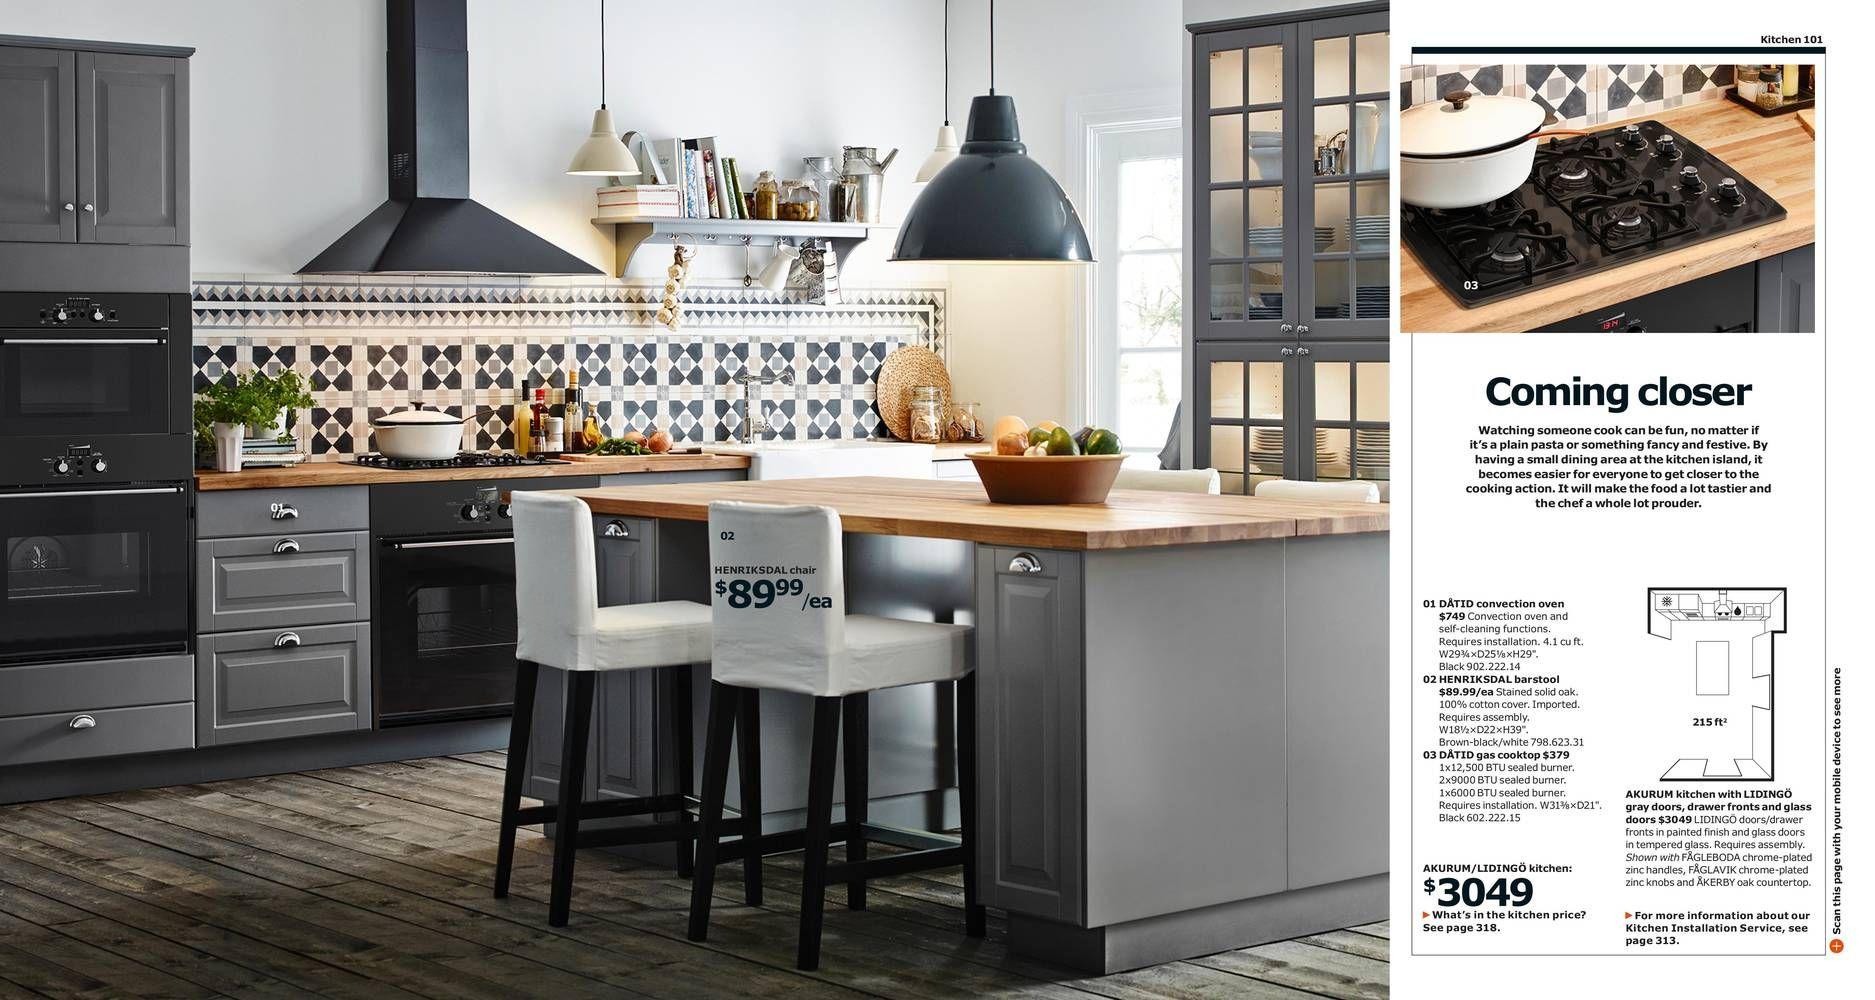 Ikea Catalog 2014 New Lidingo Gray Kitchen Doors Kitchen Renovation Cost Kitchen Renovation Complete Kitchen Renovations